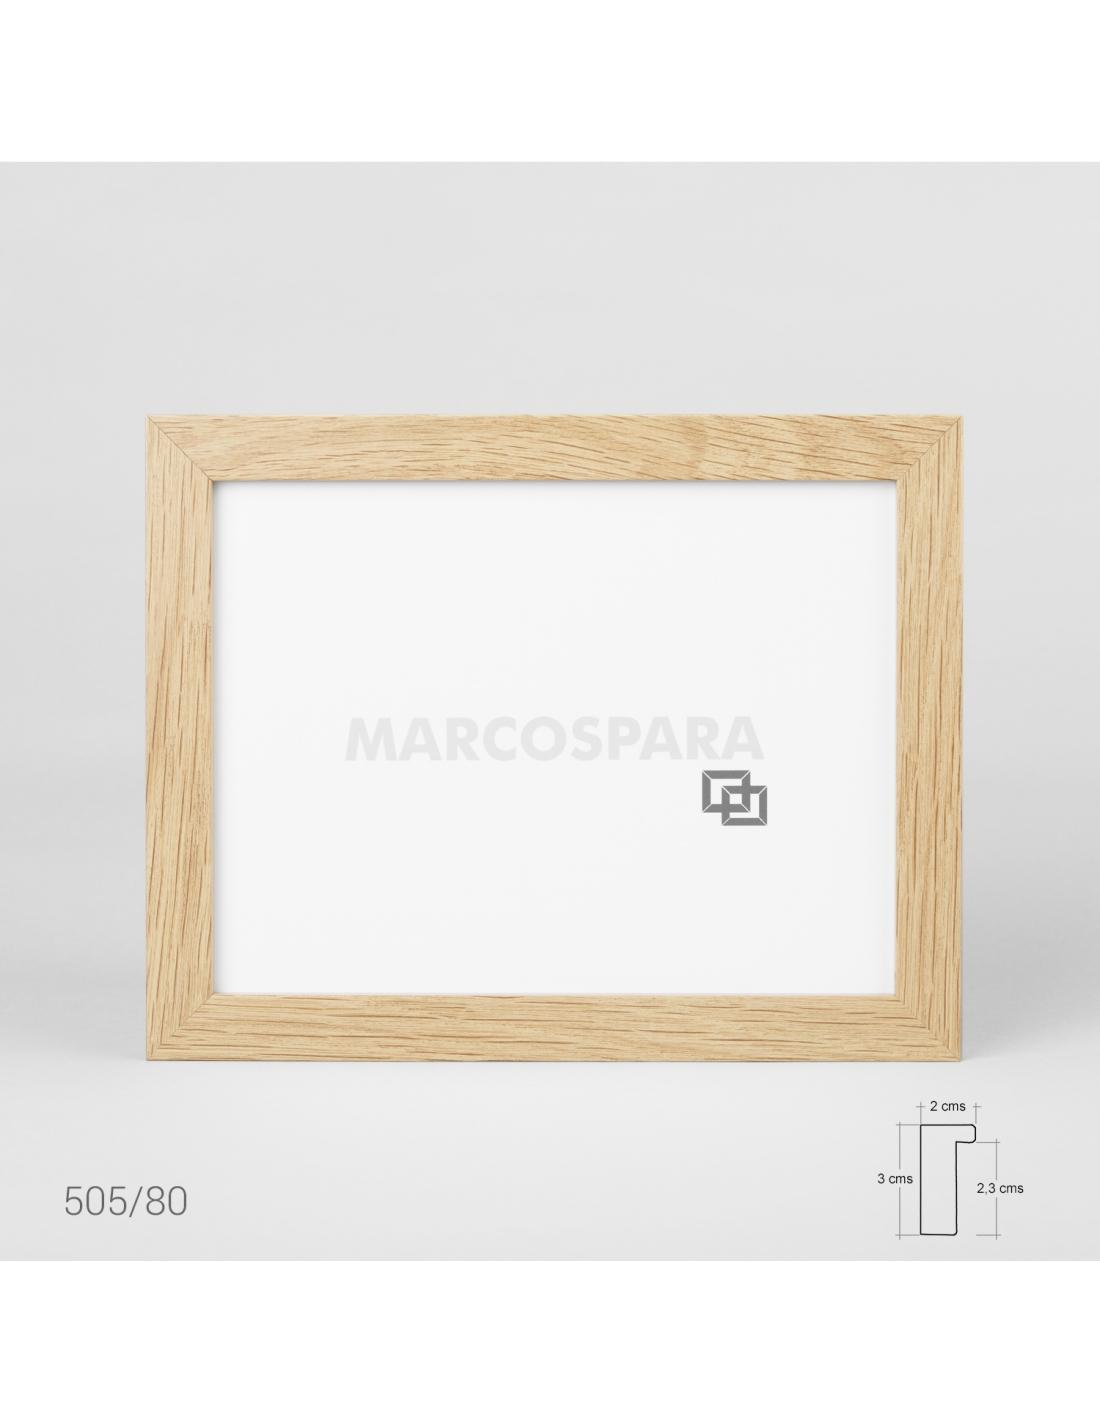 Marcos de madera para posters M505